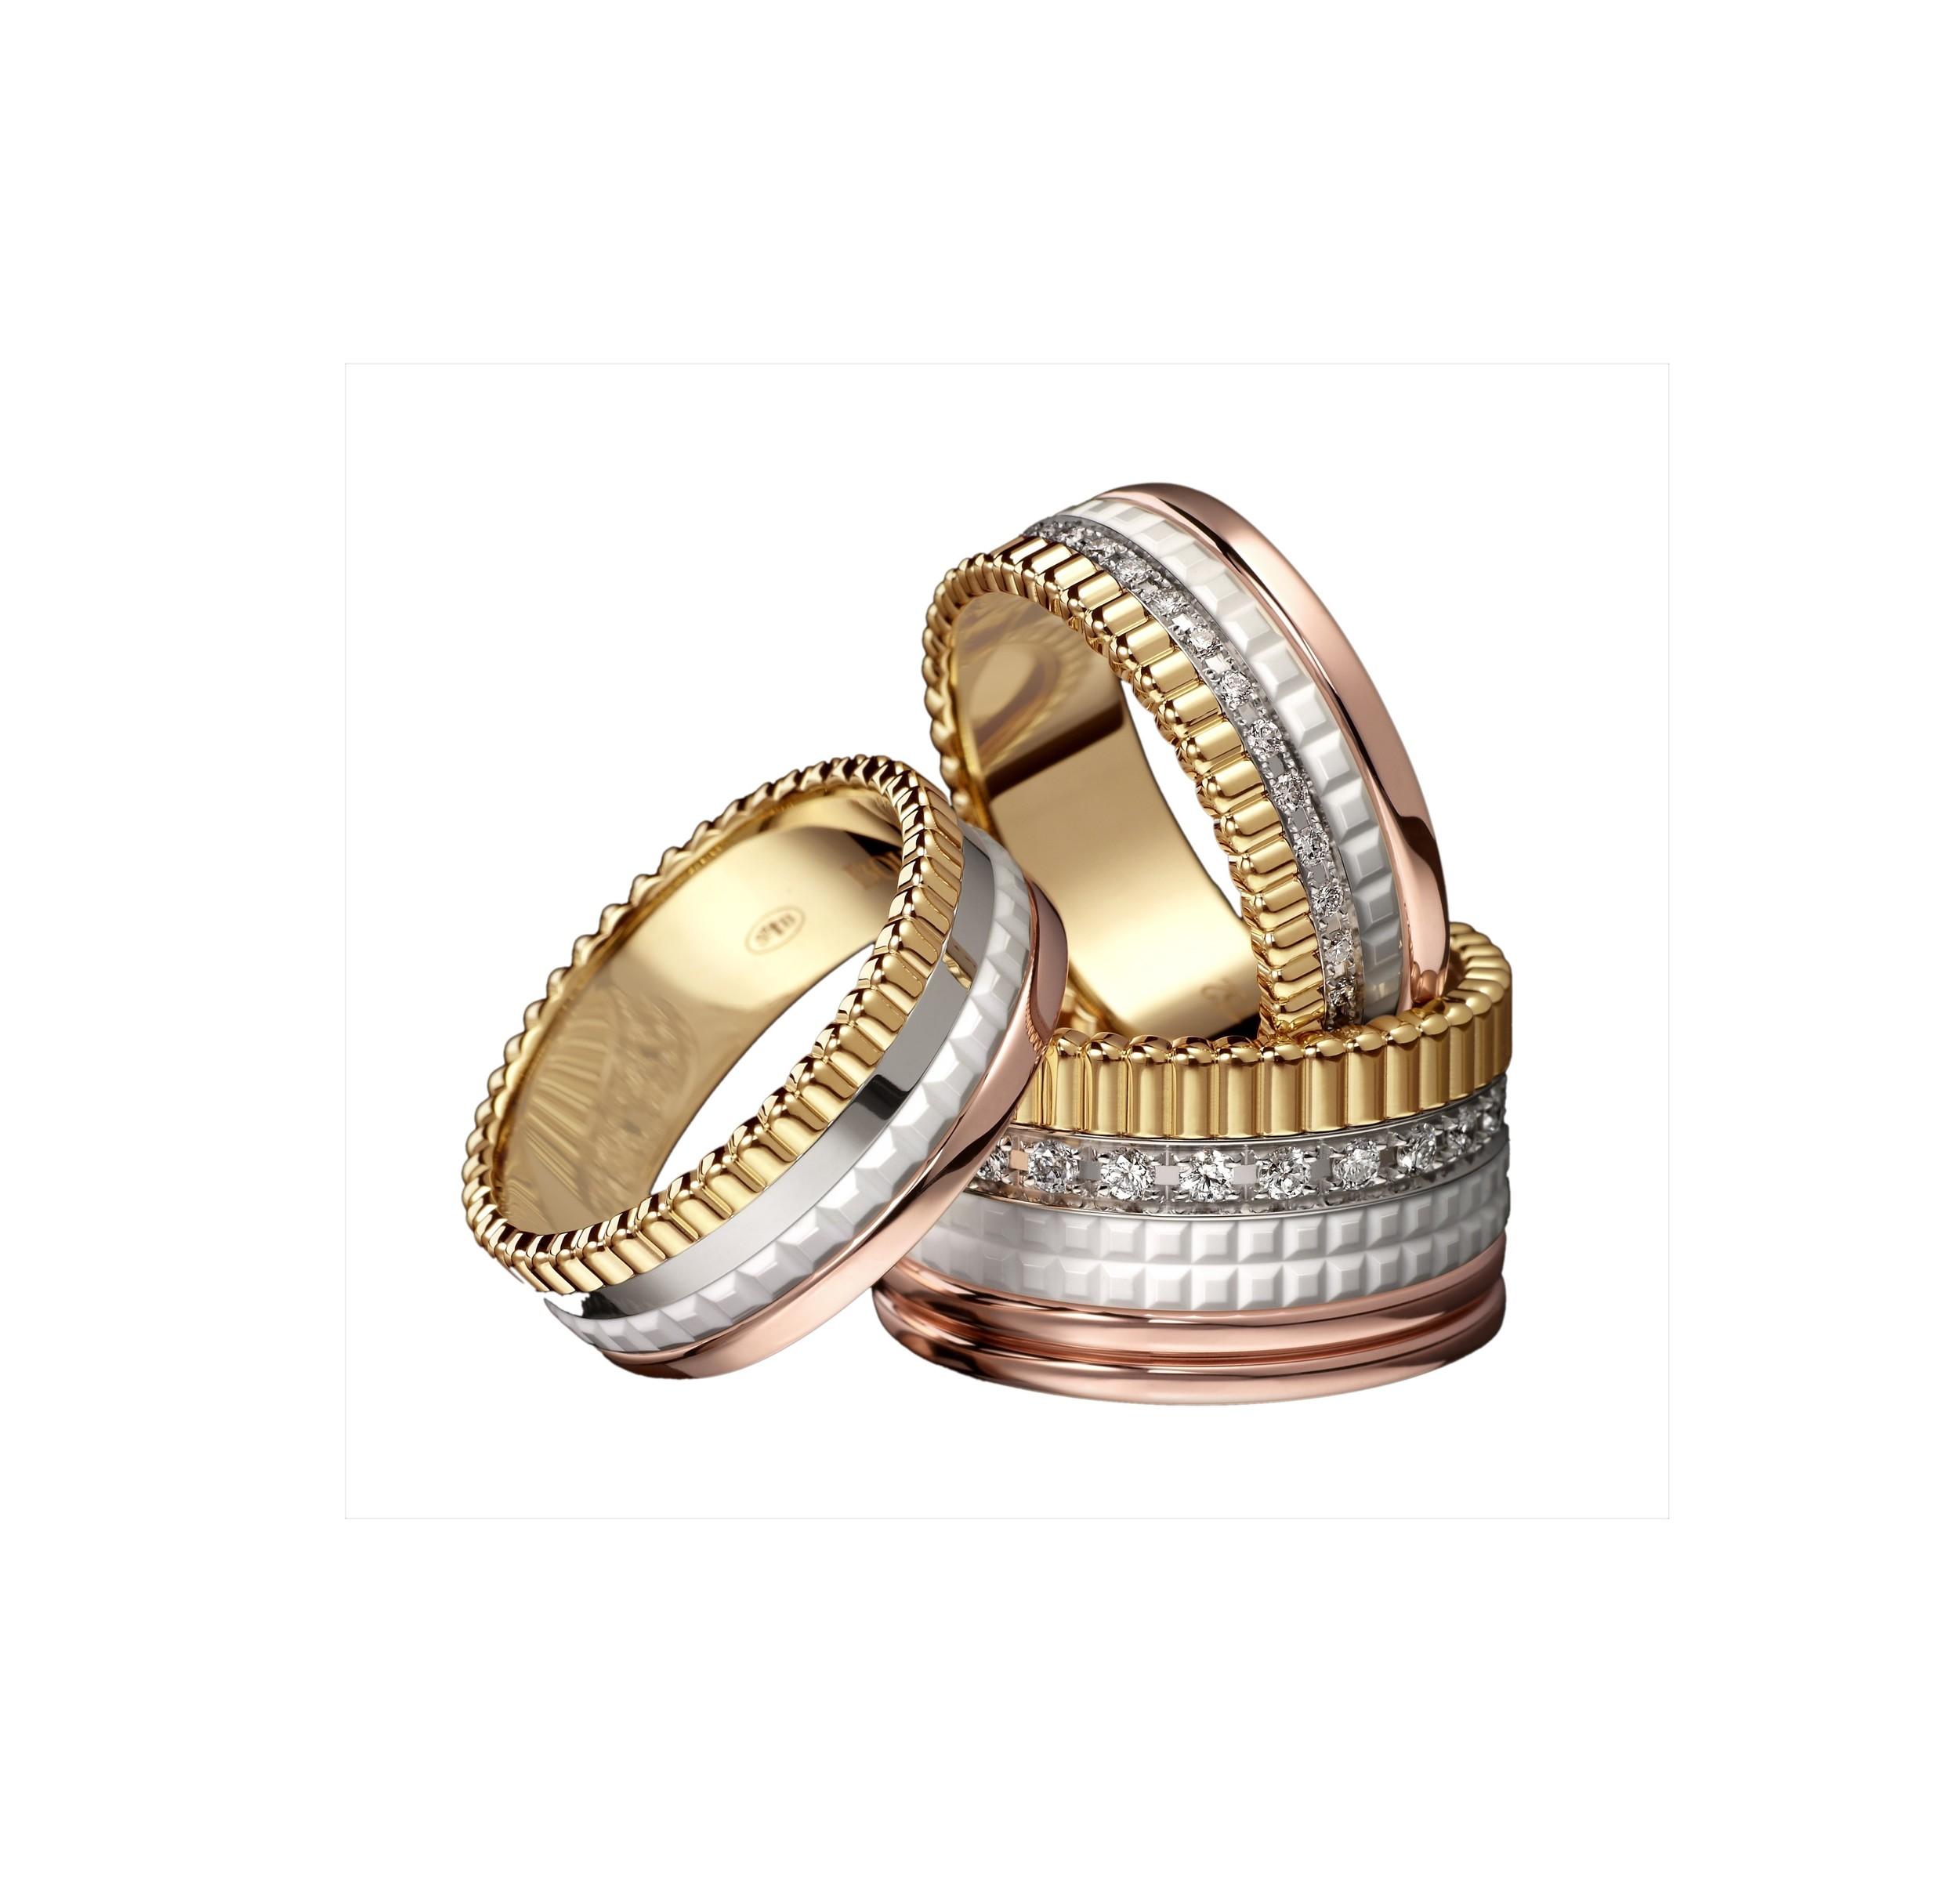 Boucheron 'Quatre White Edition' rings. From $3,440